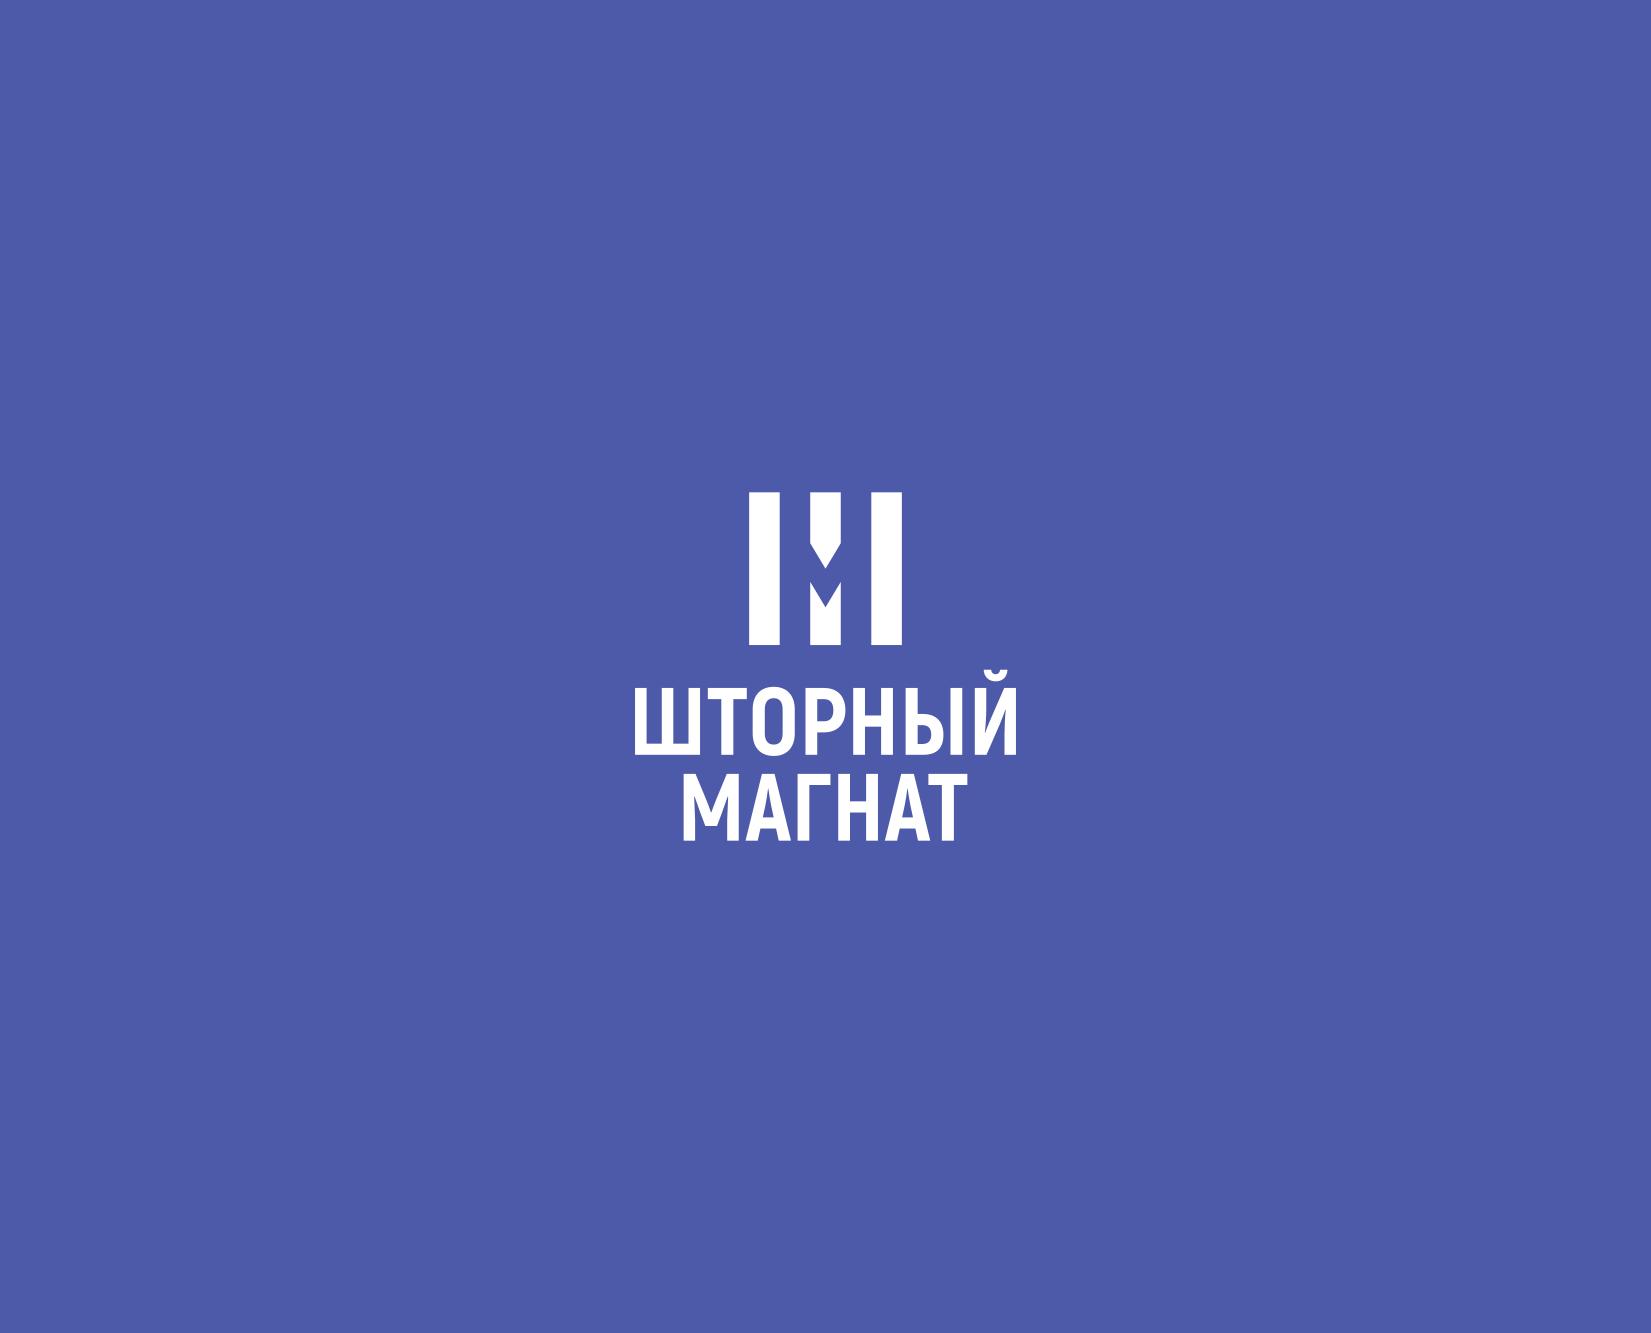 Логотип и фирменный стиль для магазина тканей. фото f_4815cd9d2610fdc2.png